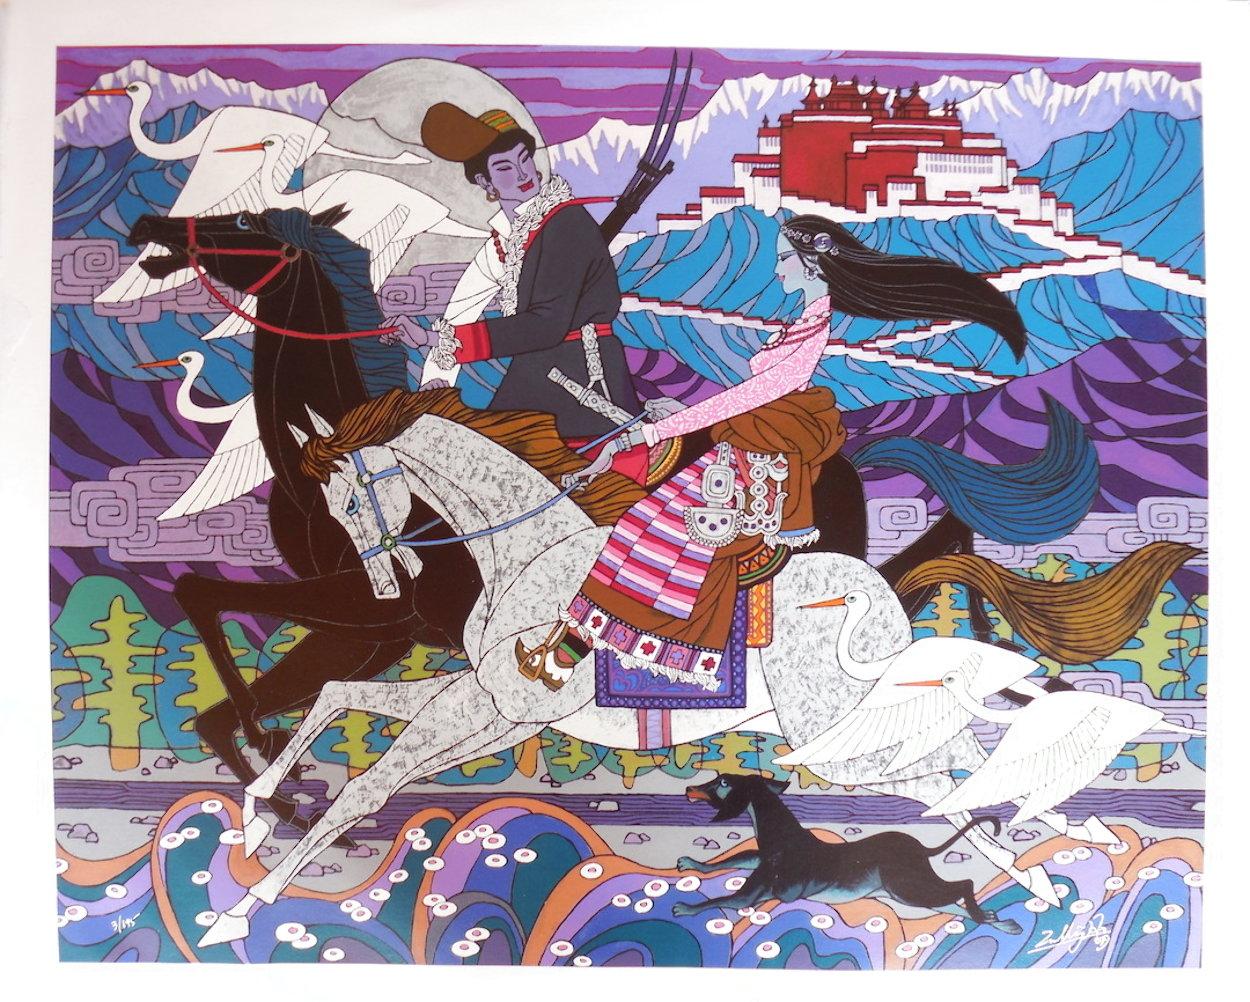 Approaching the Budhala Palace Limited Edition Print by Zu Ming Ho